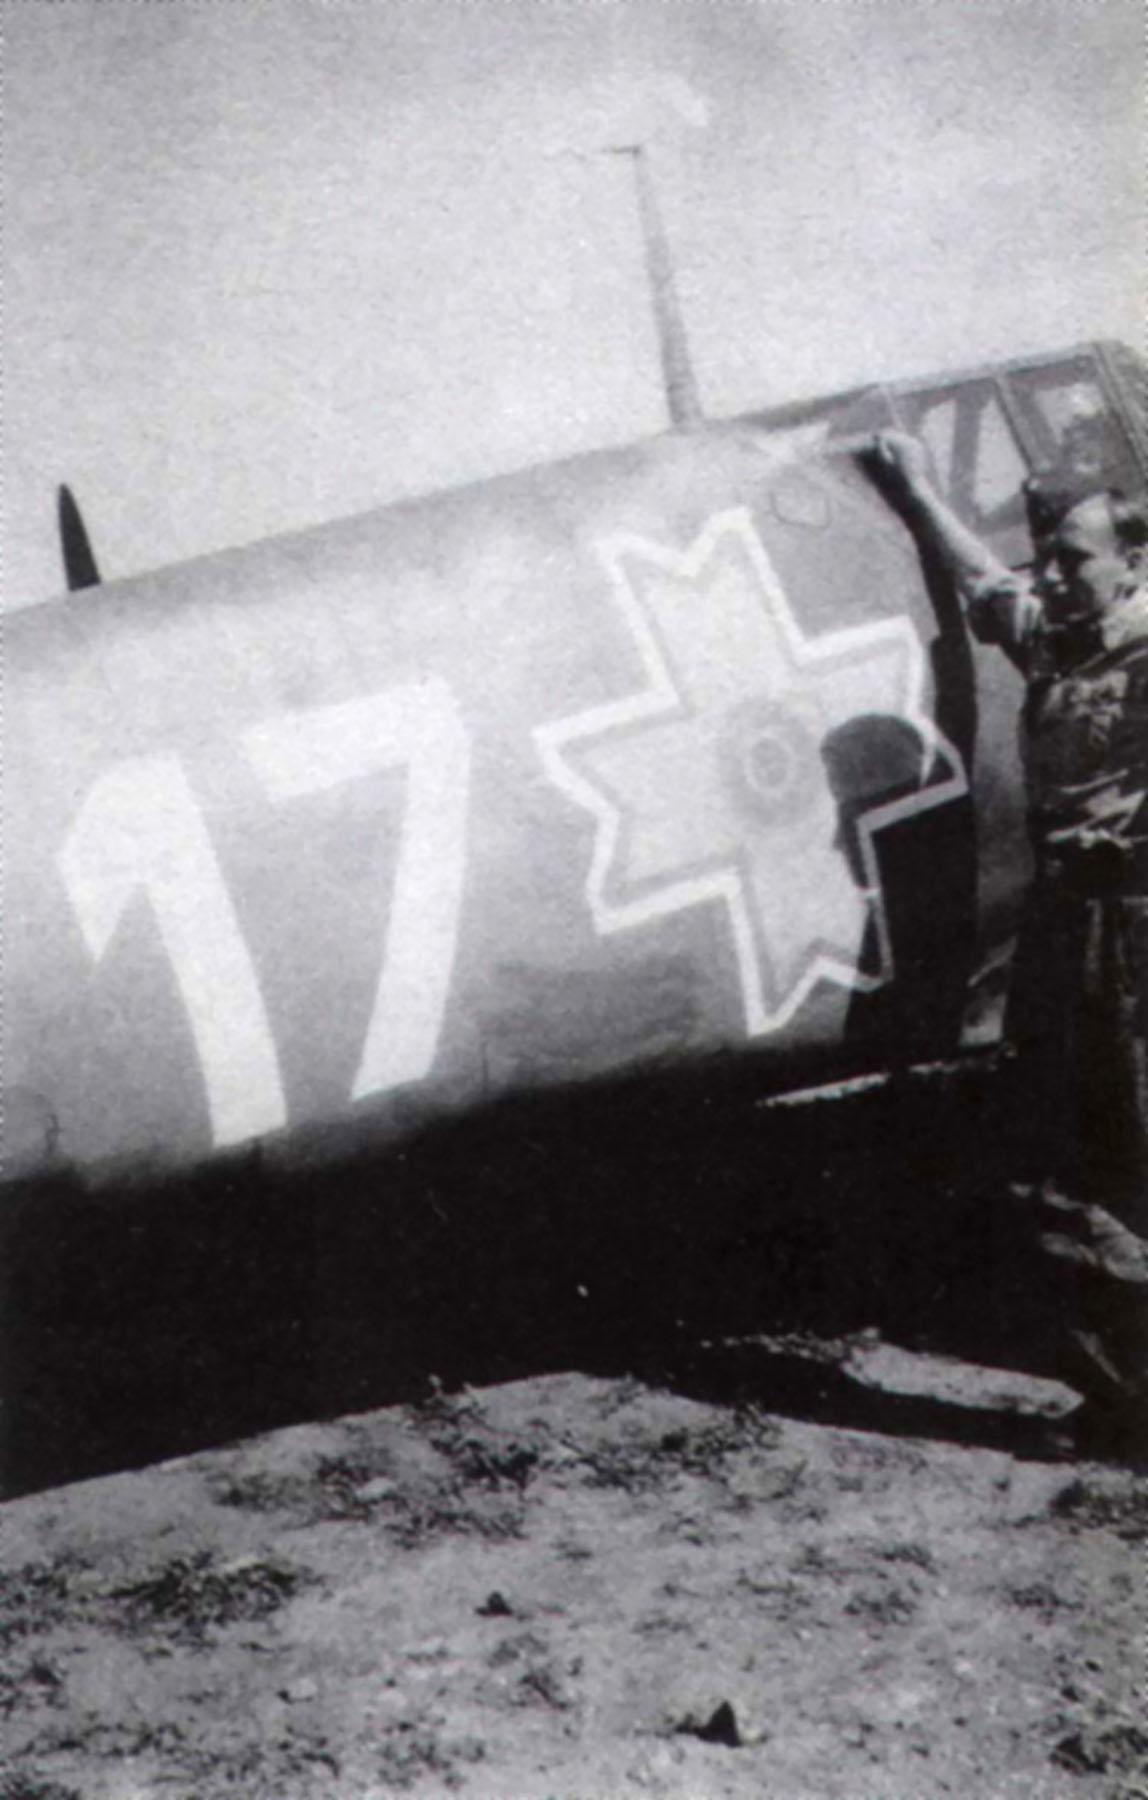 Messerschmitt Bf 109G2 RRAF 7FG White 17 Rumanian AF Dnepropetrovsk Southern Russia April 1943 01